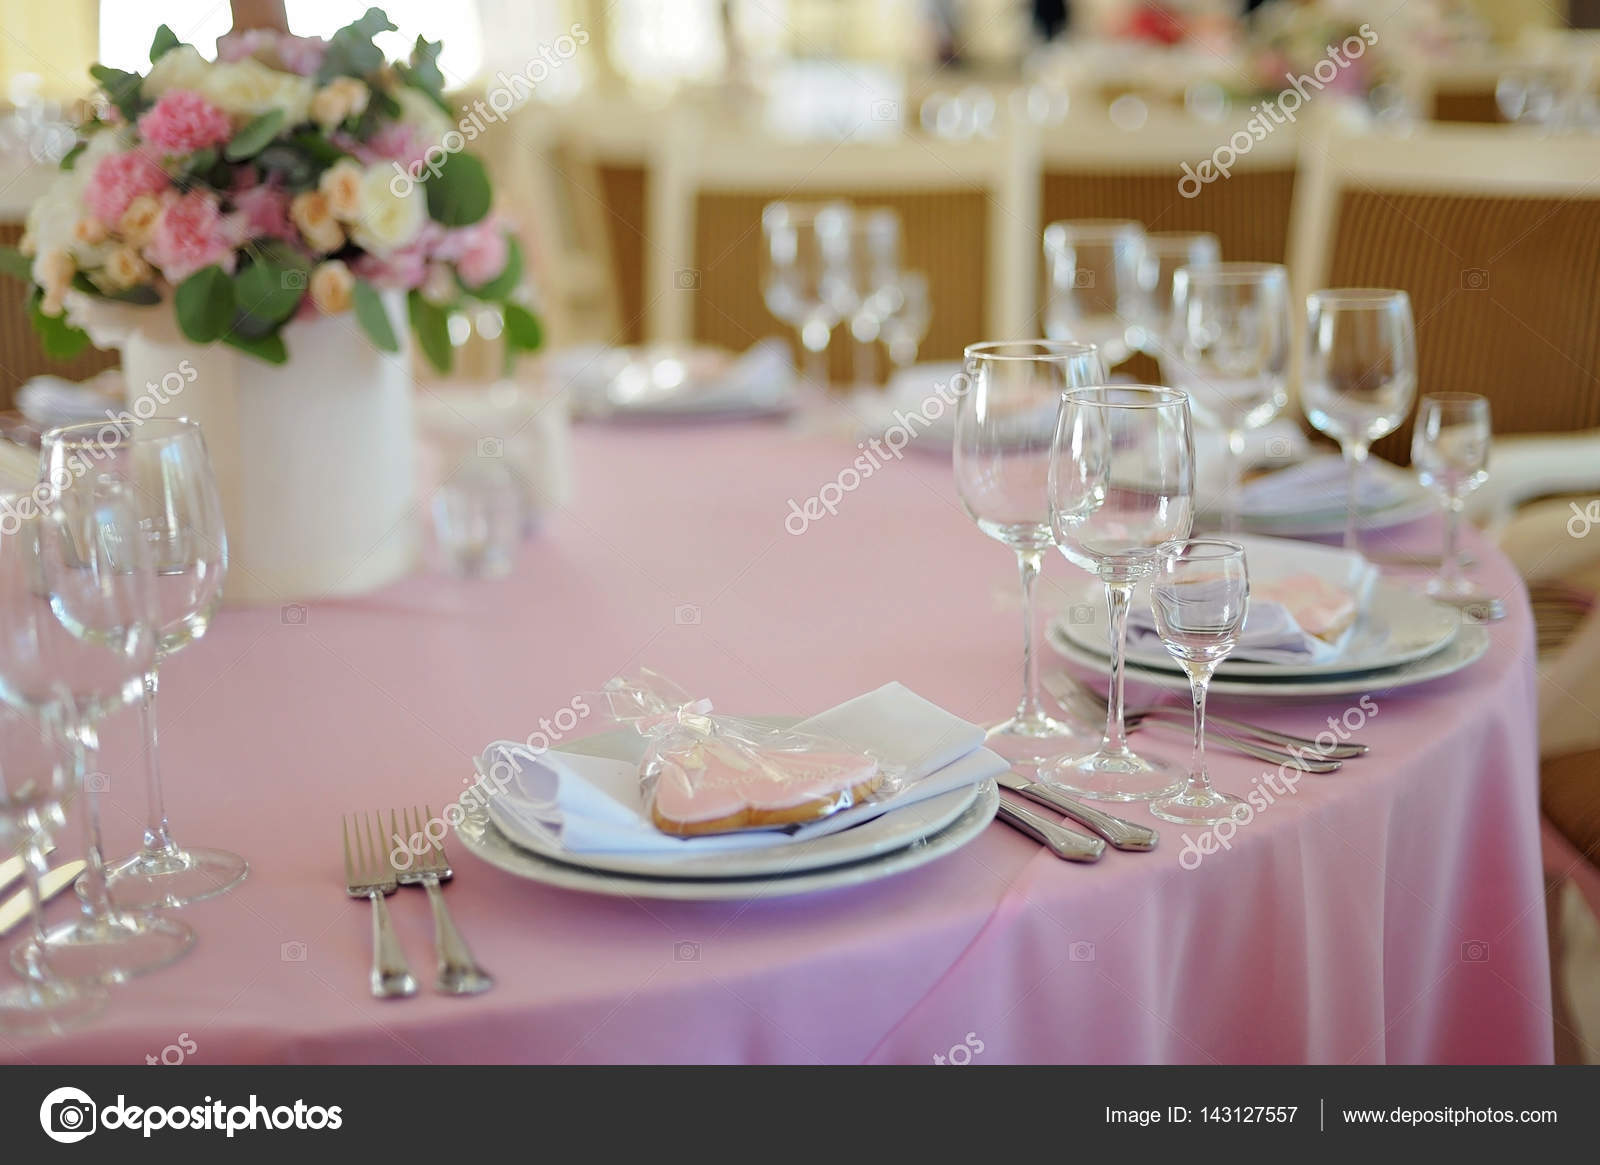 Elegant table setting with tasty gift \u2014 Stock Photo & Elegant table setting with tasty gift \u2014 Stock Photo © olgaburtseva ...